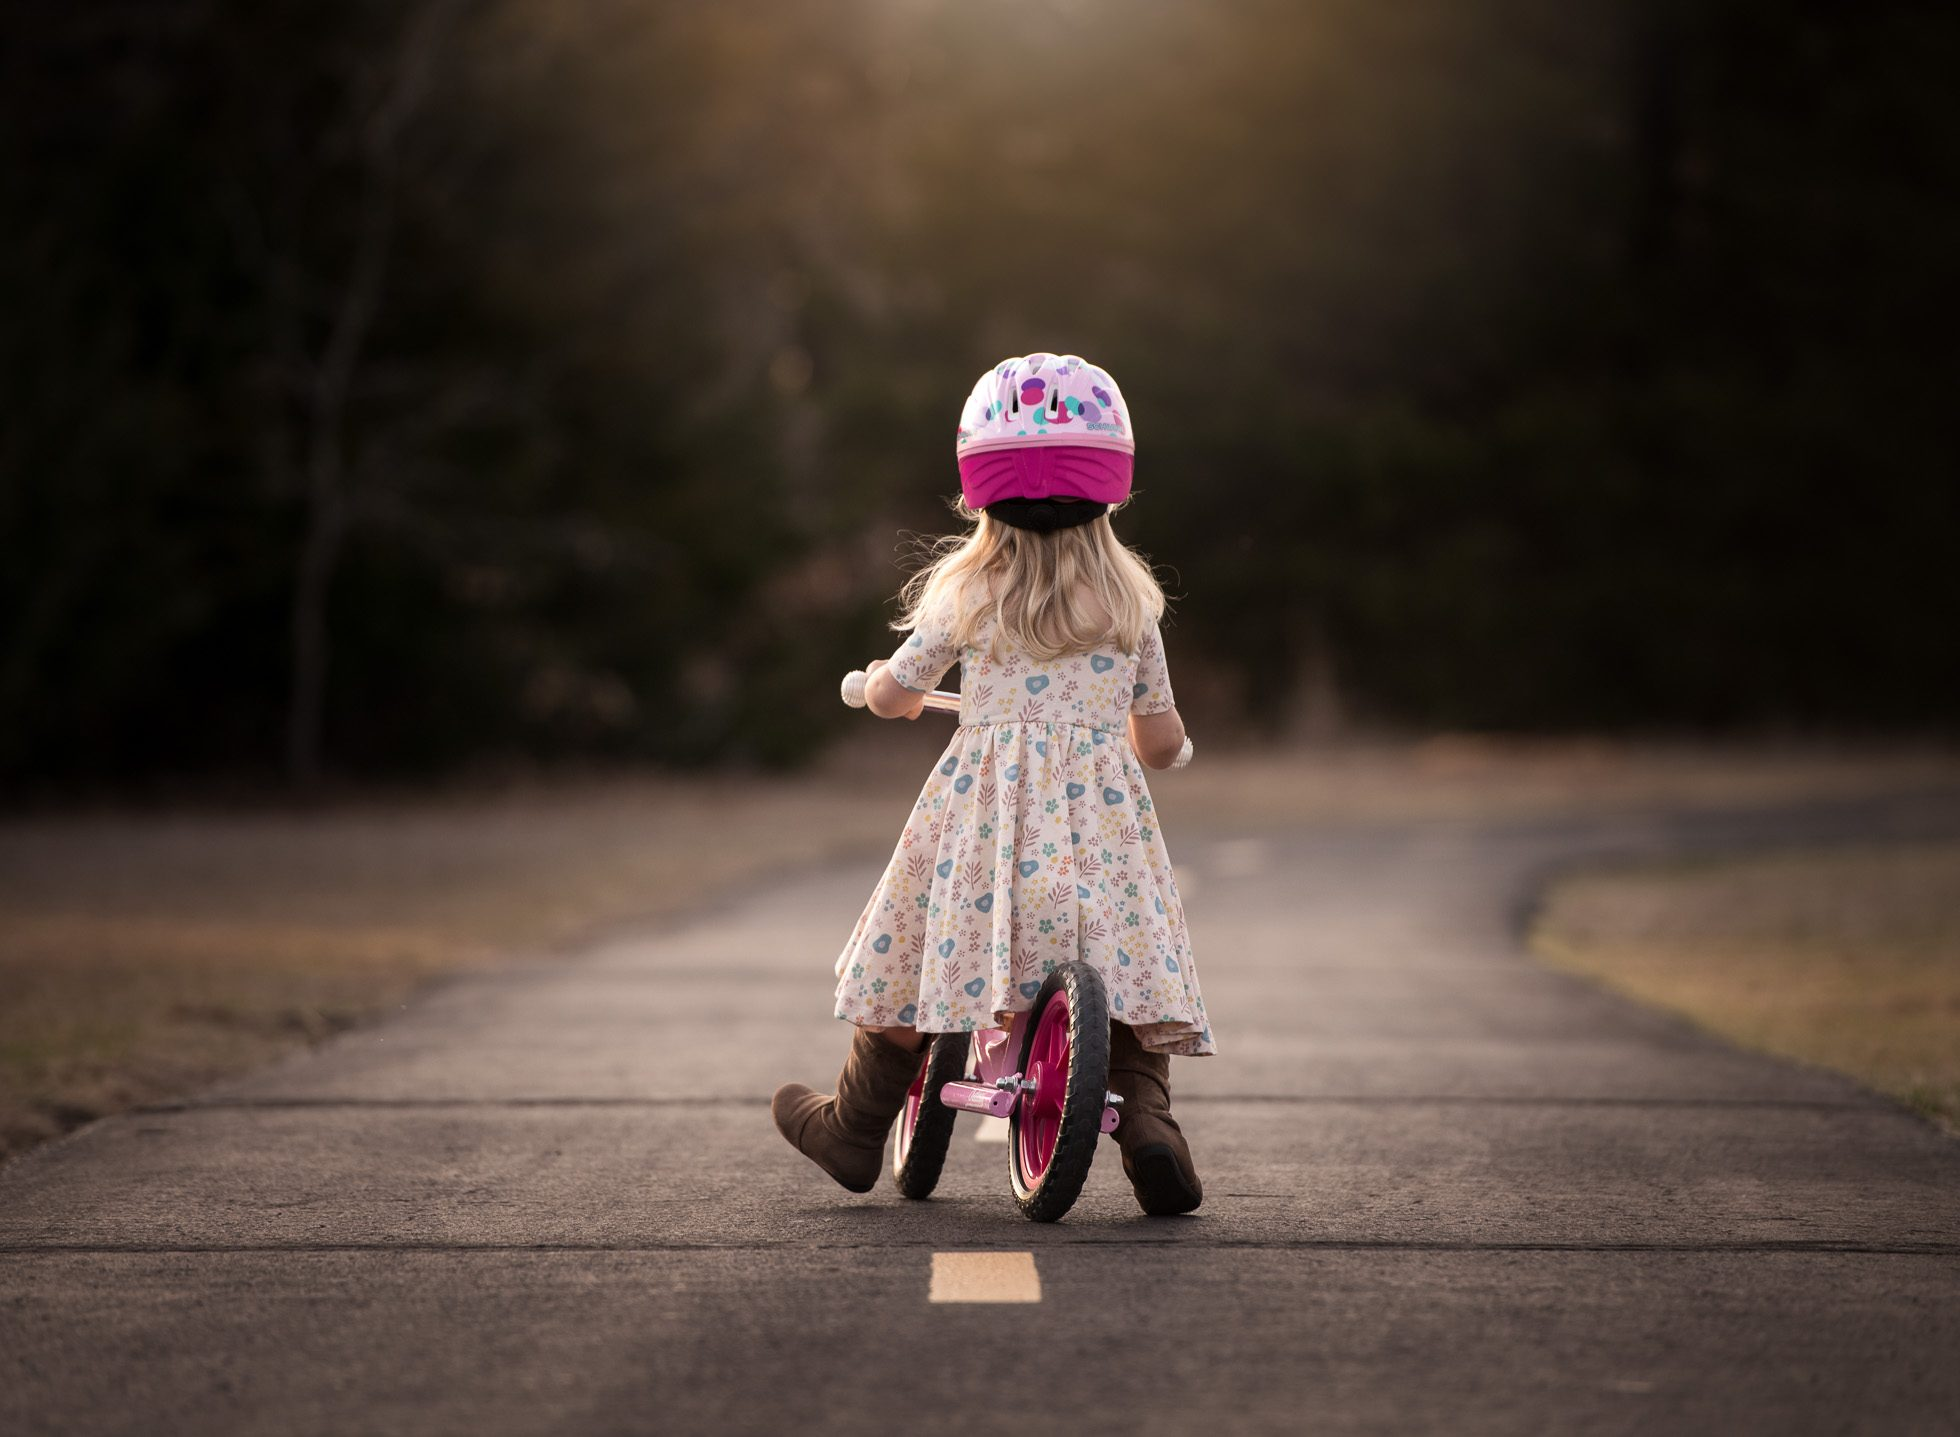 toddler girl riding balance bike down trail evening ride young girl on balance bike pink helmet edmond ok photographer oklahoma city natural light photographer kate luber photography